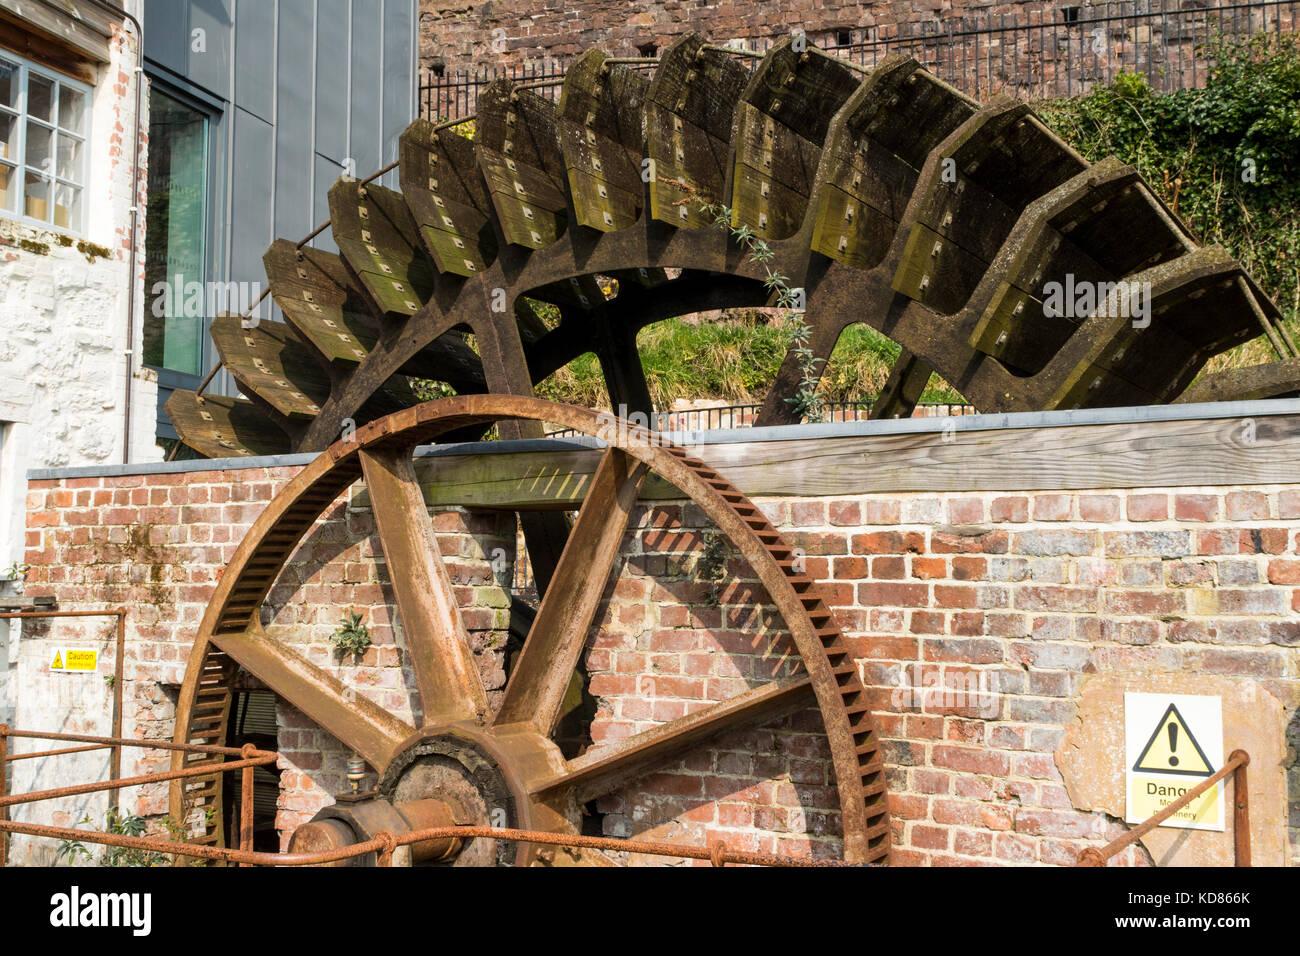 Detail of the Refurbished Water Wheel #2– Devon Wildlife Trust Headquarters, Cricklepit Mill, Exeter, Devon. - Stock Image